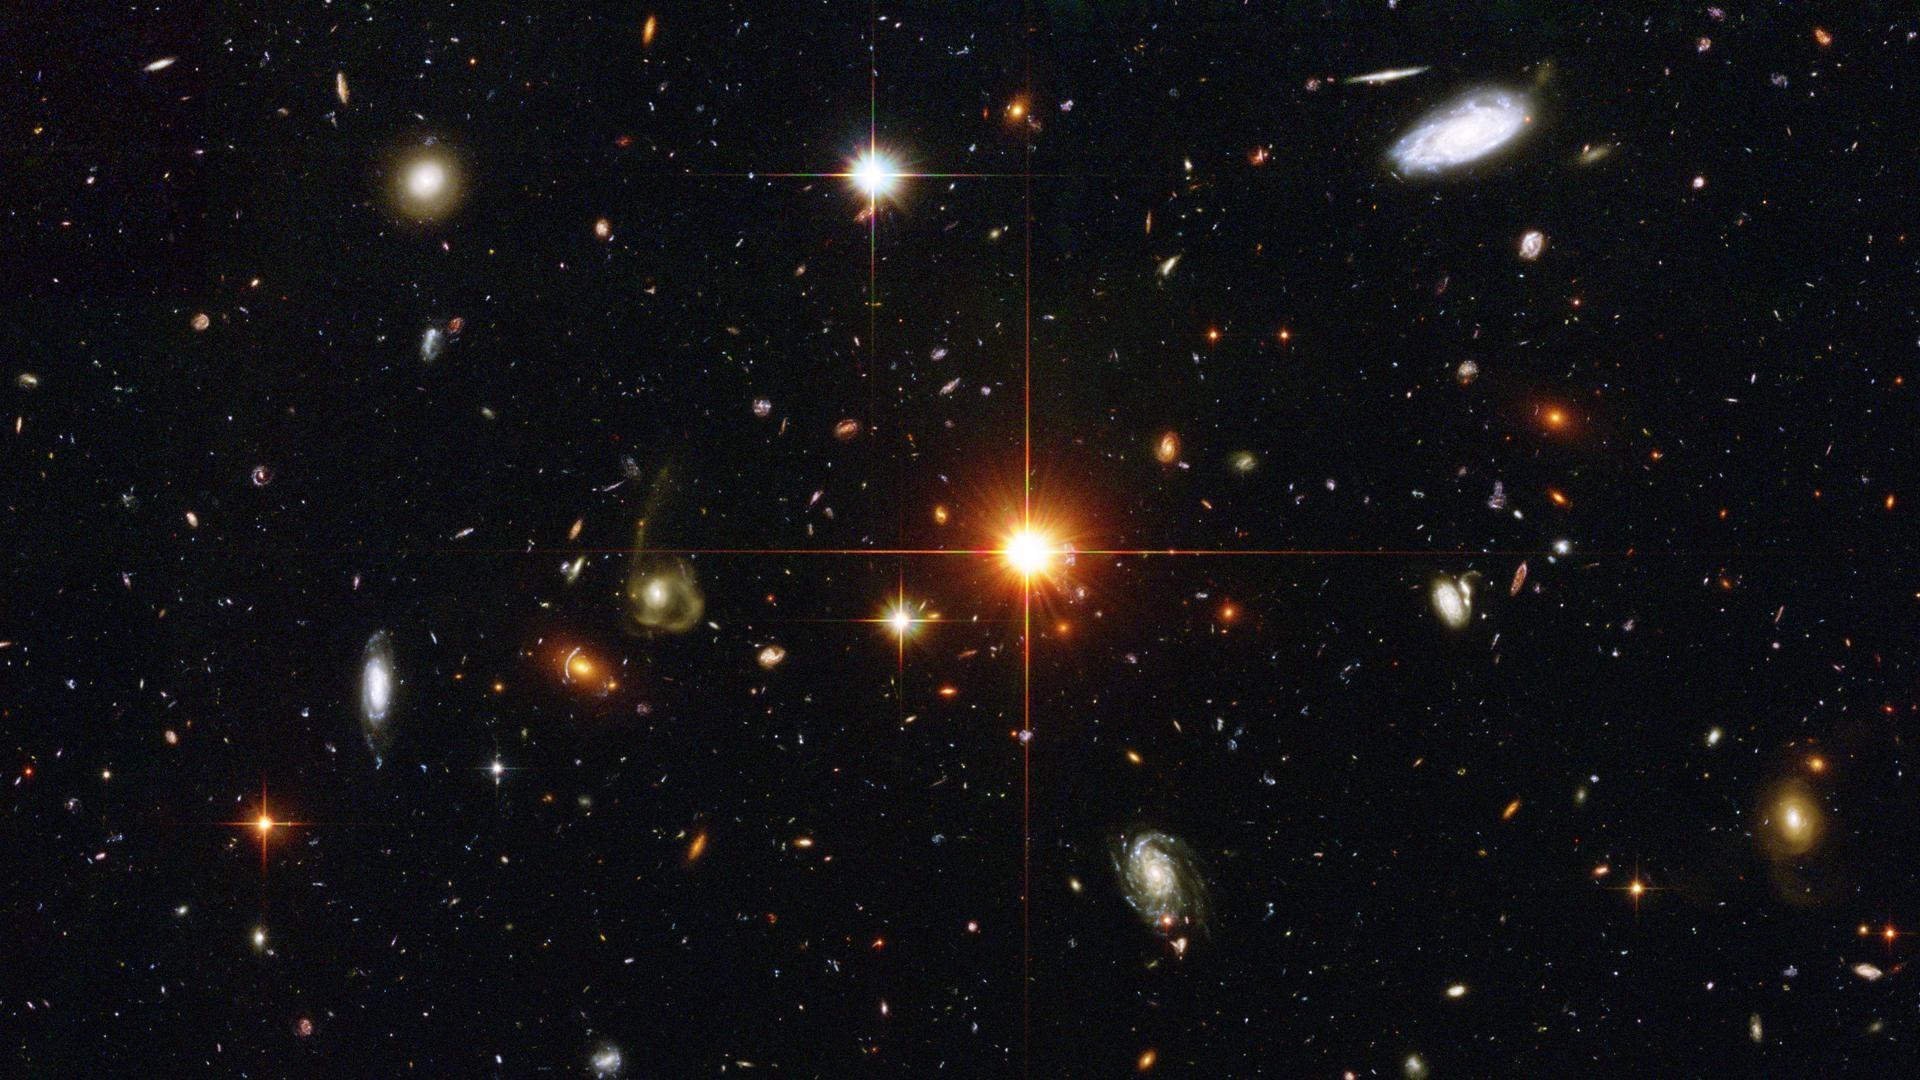 Hubble Ultra Deep Field Wallpapers (44 Wallpapers)